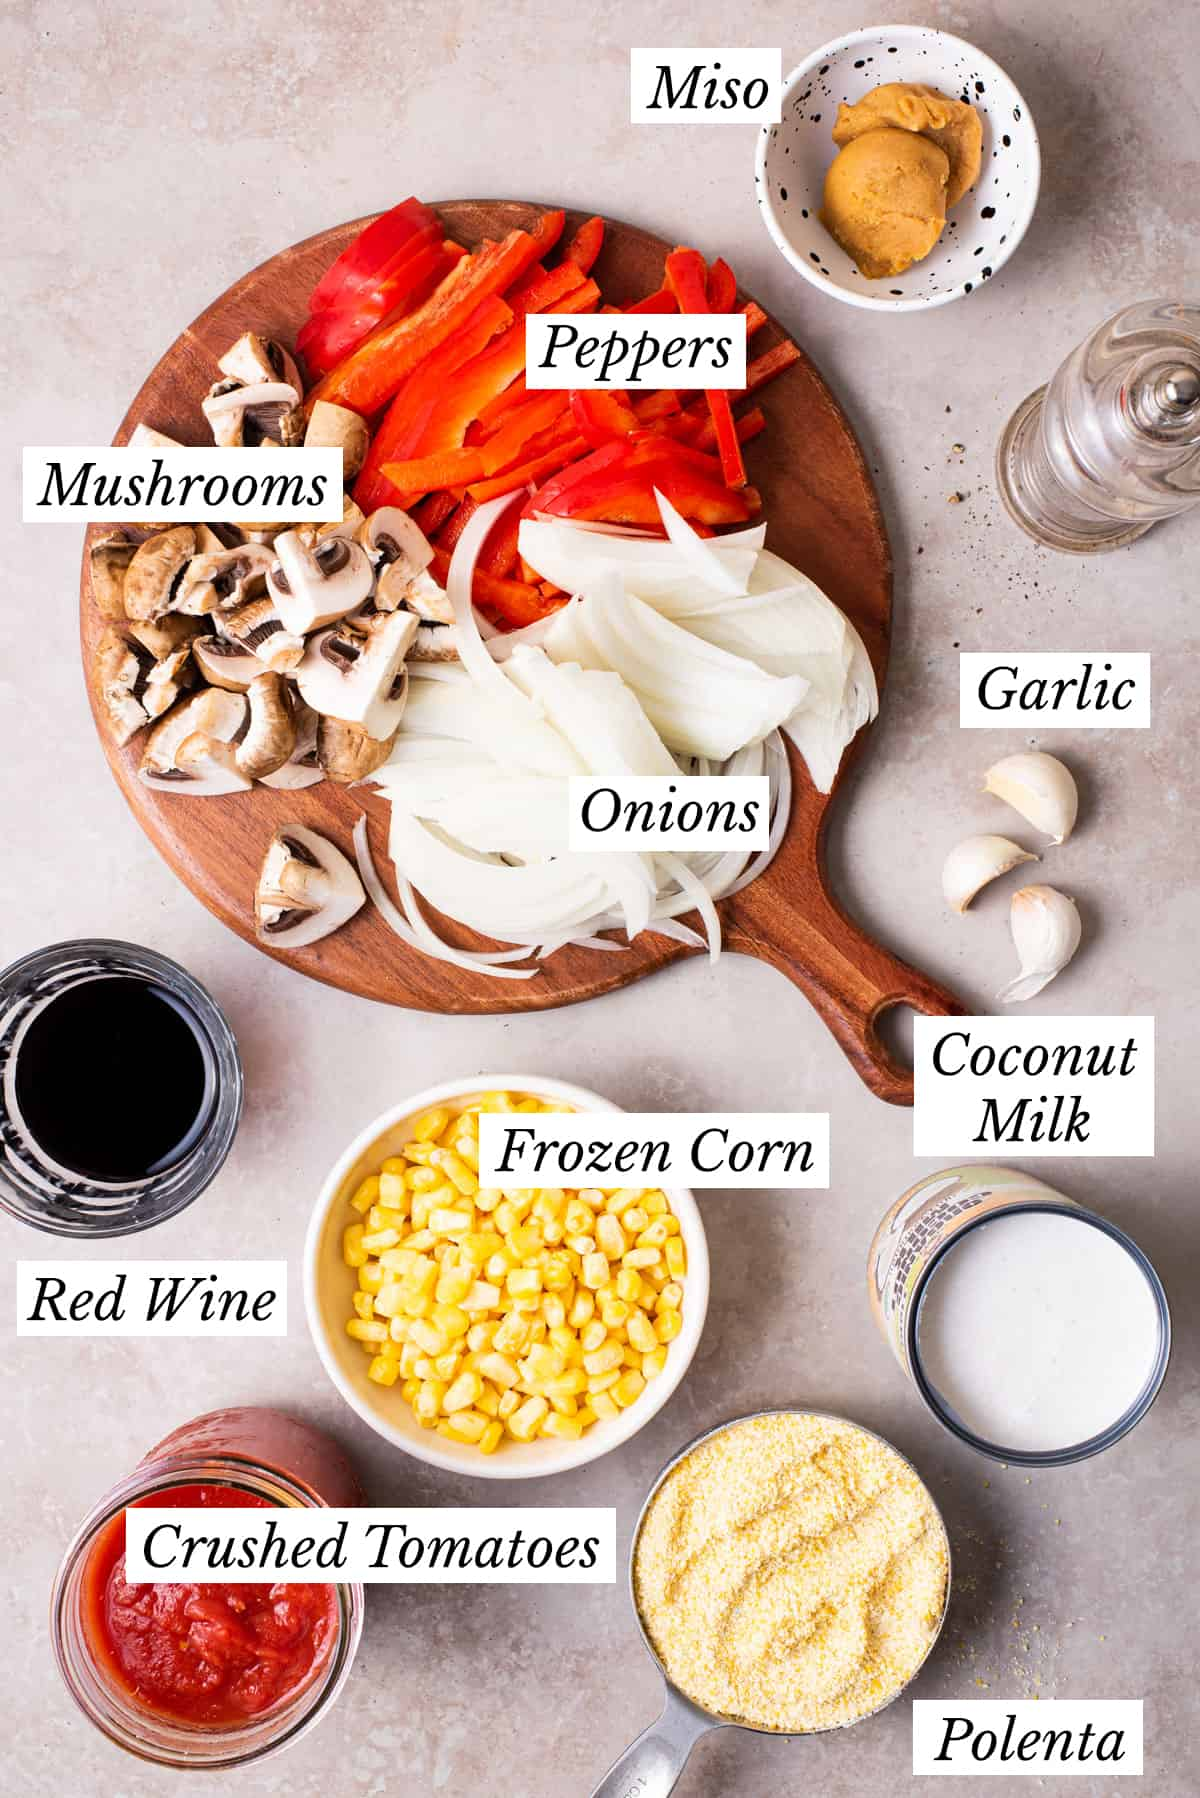 Ingredients gathered to make creamy miso polenta with mushroom ragu.